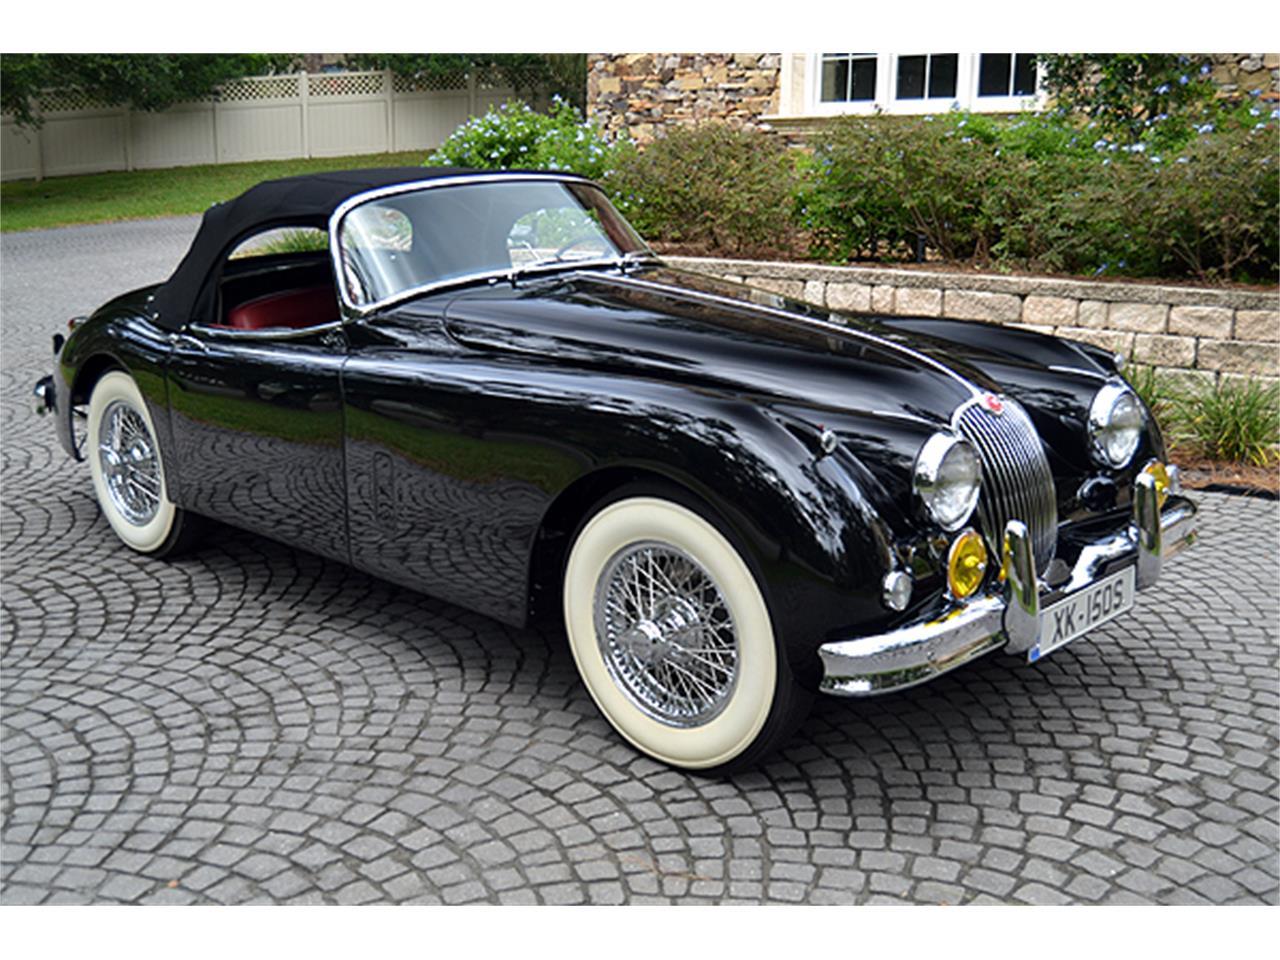 1958 Jaguar Xk150 For Sale Classiccarscom Cc 1032962